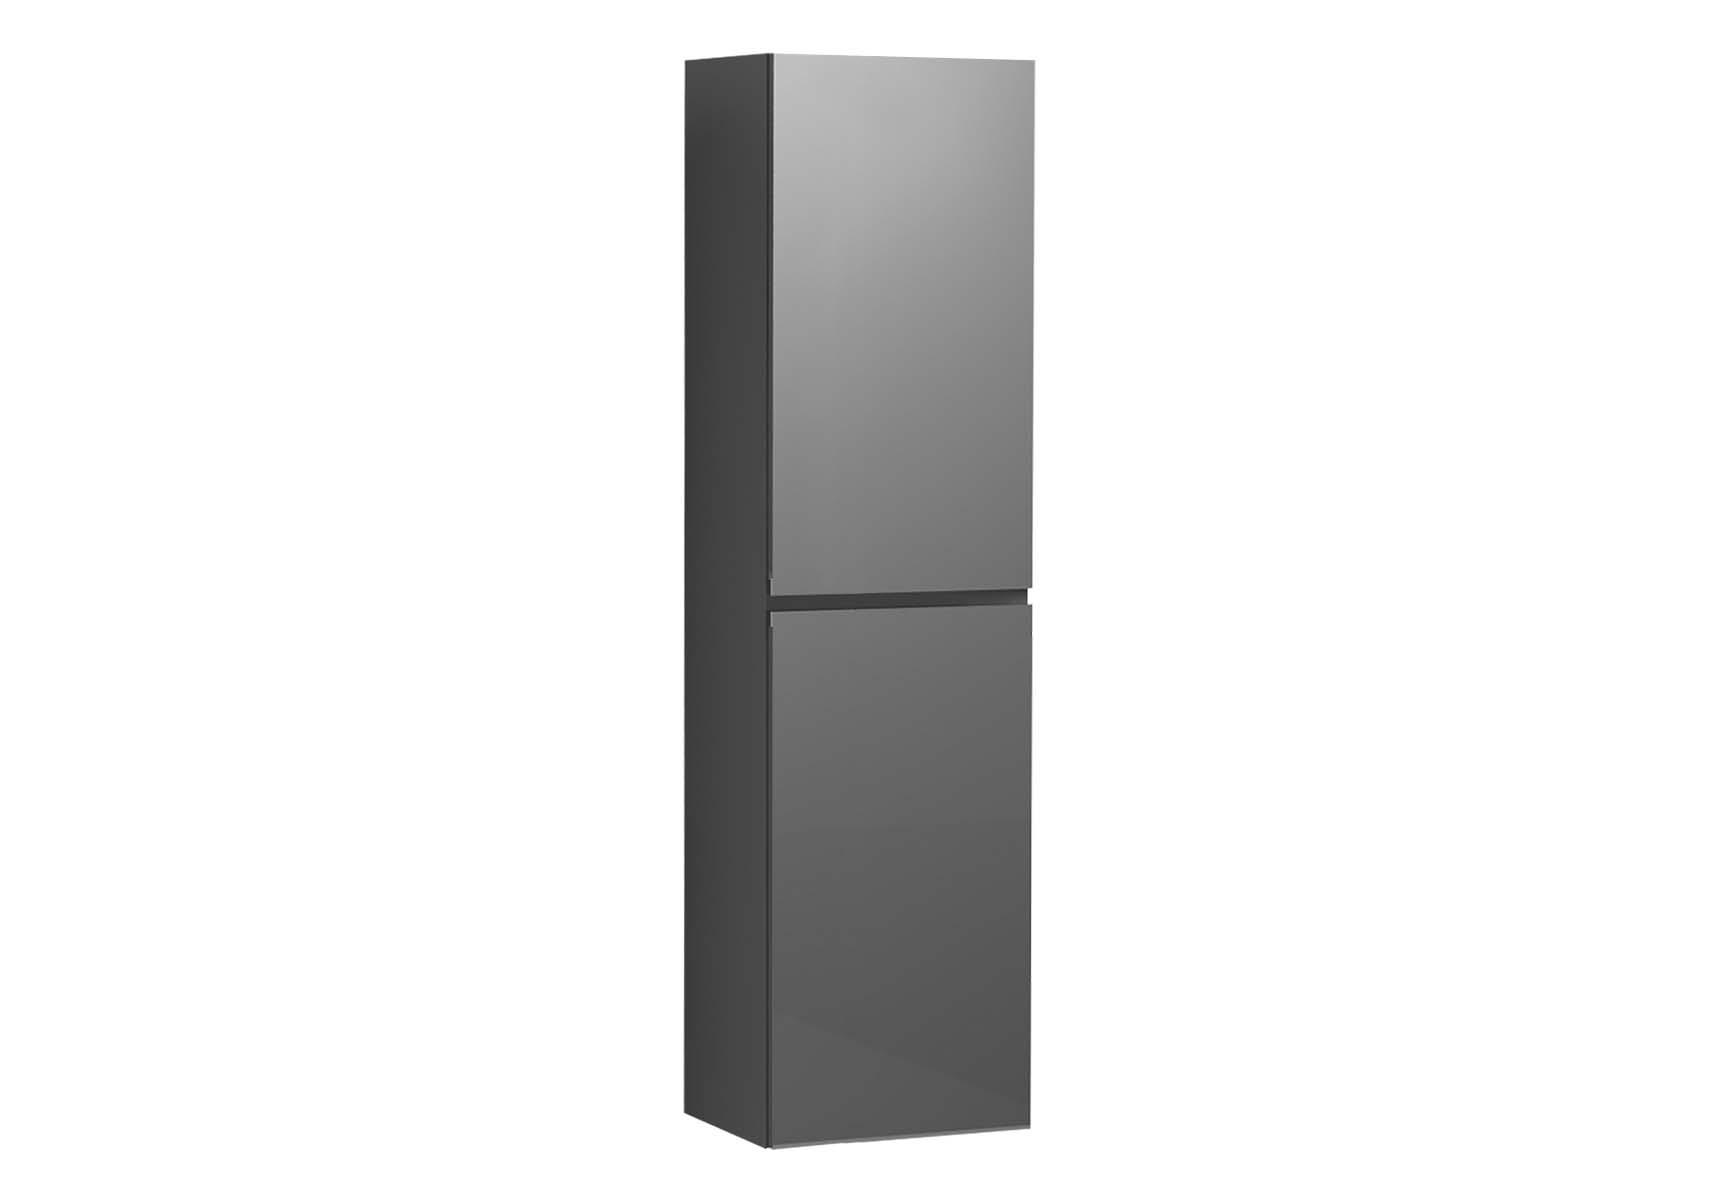 Memoria Tall Unit with Door, Grey High Gloss, Left